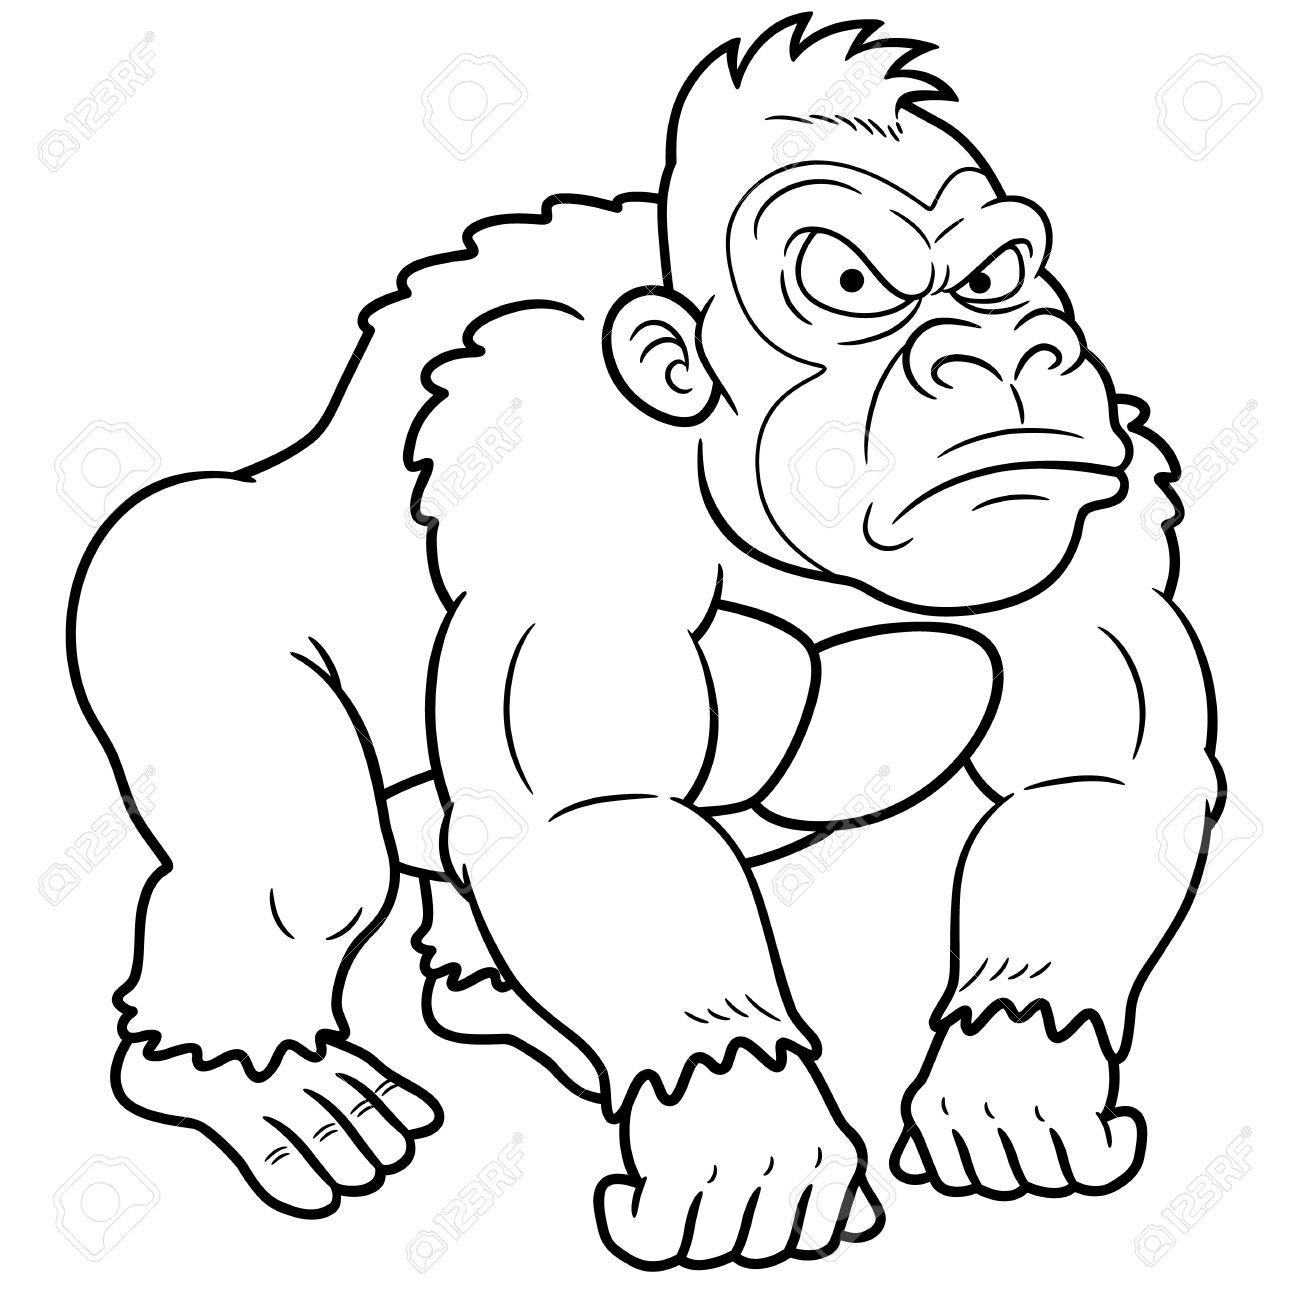 Gorilla clipart black and white » Clipart Station.